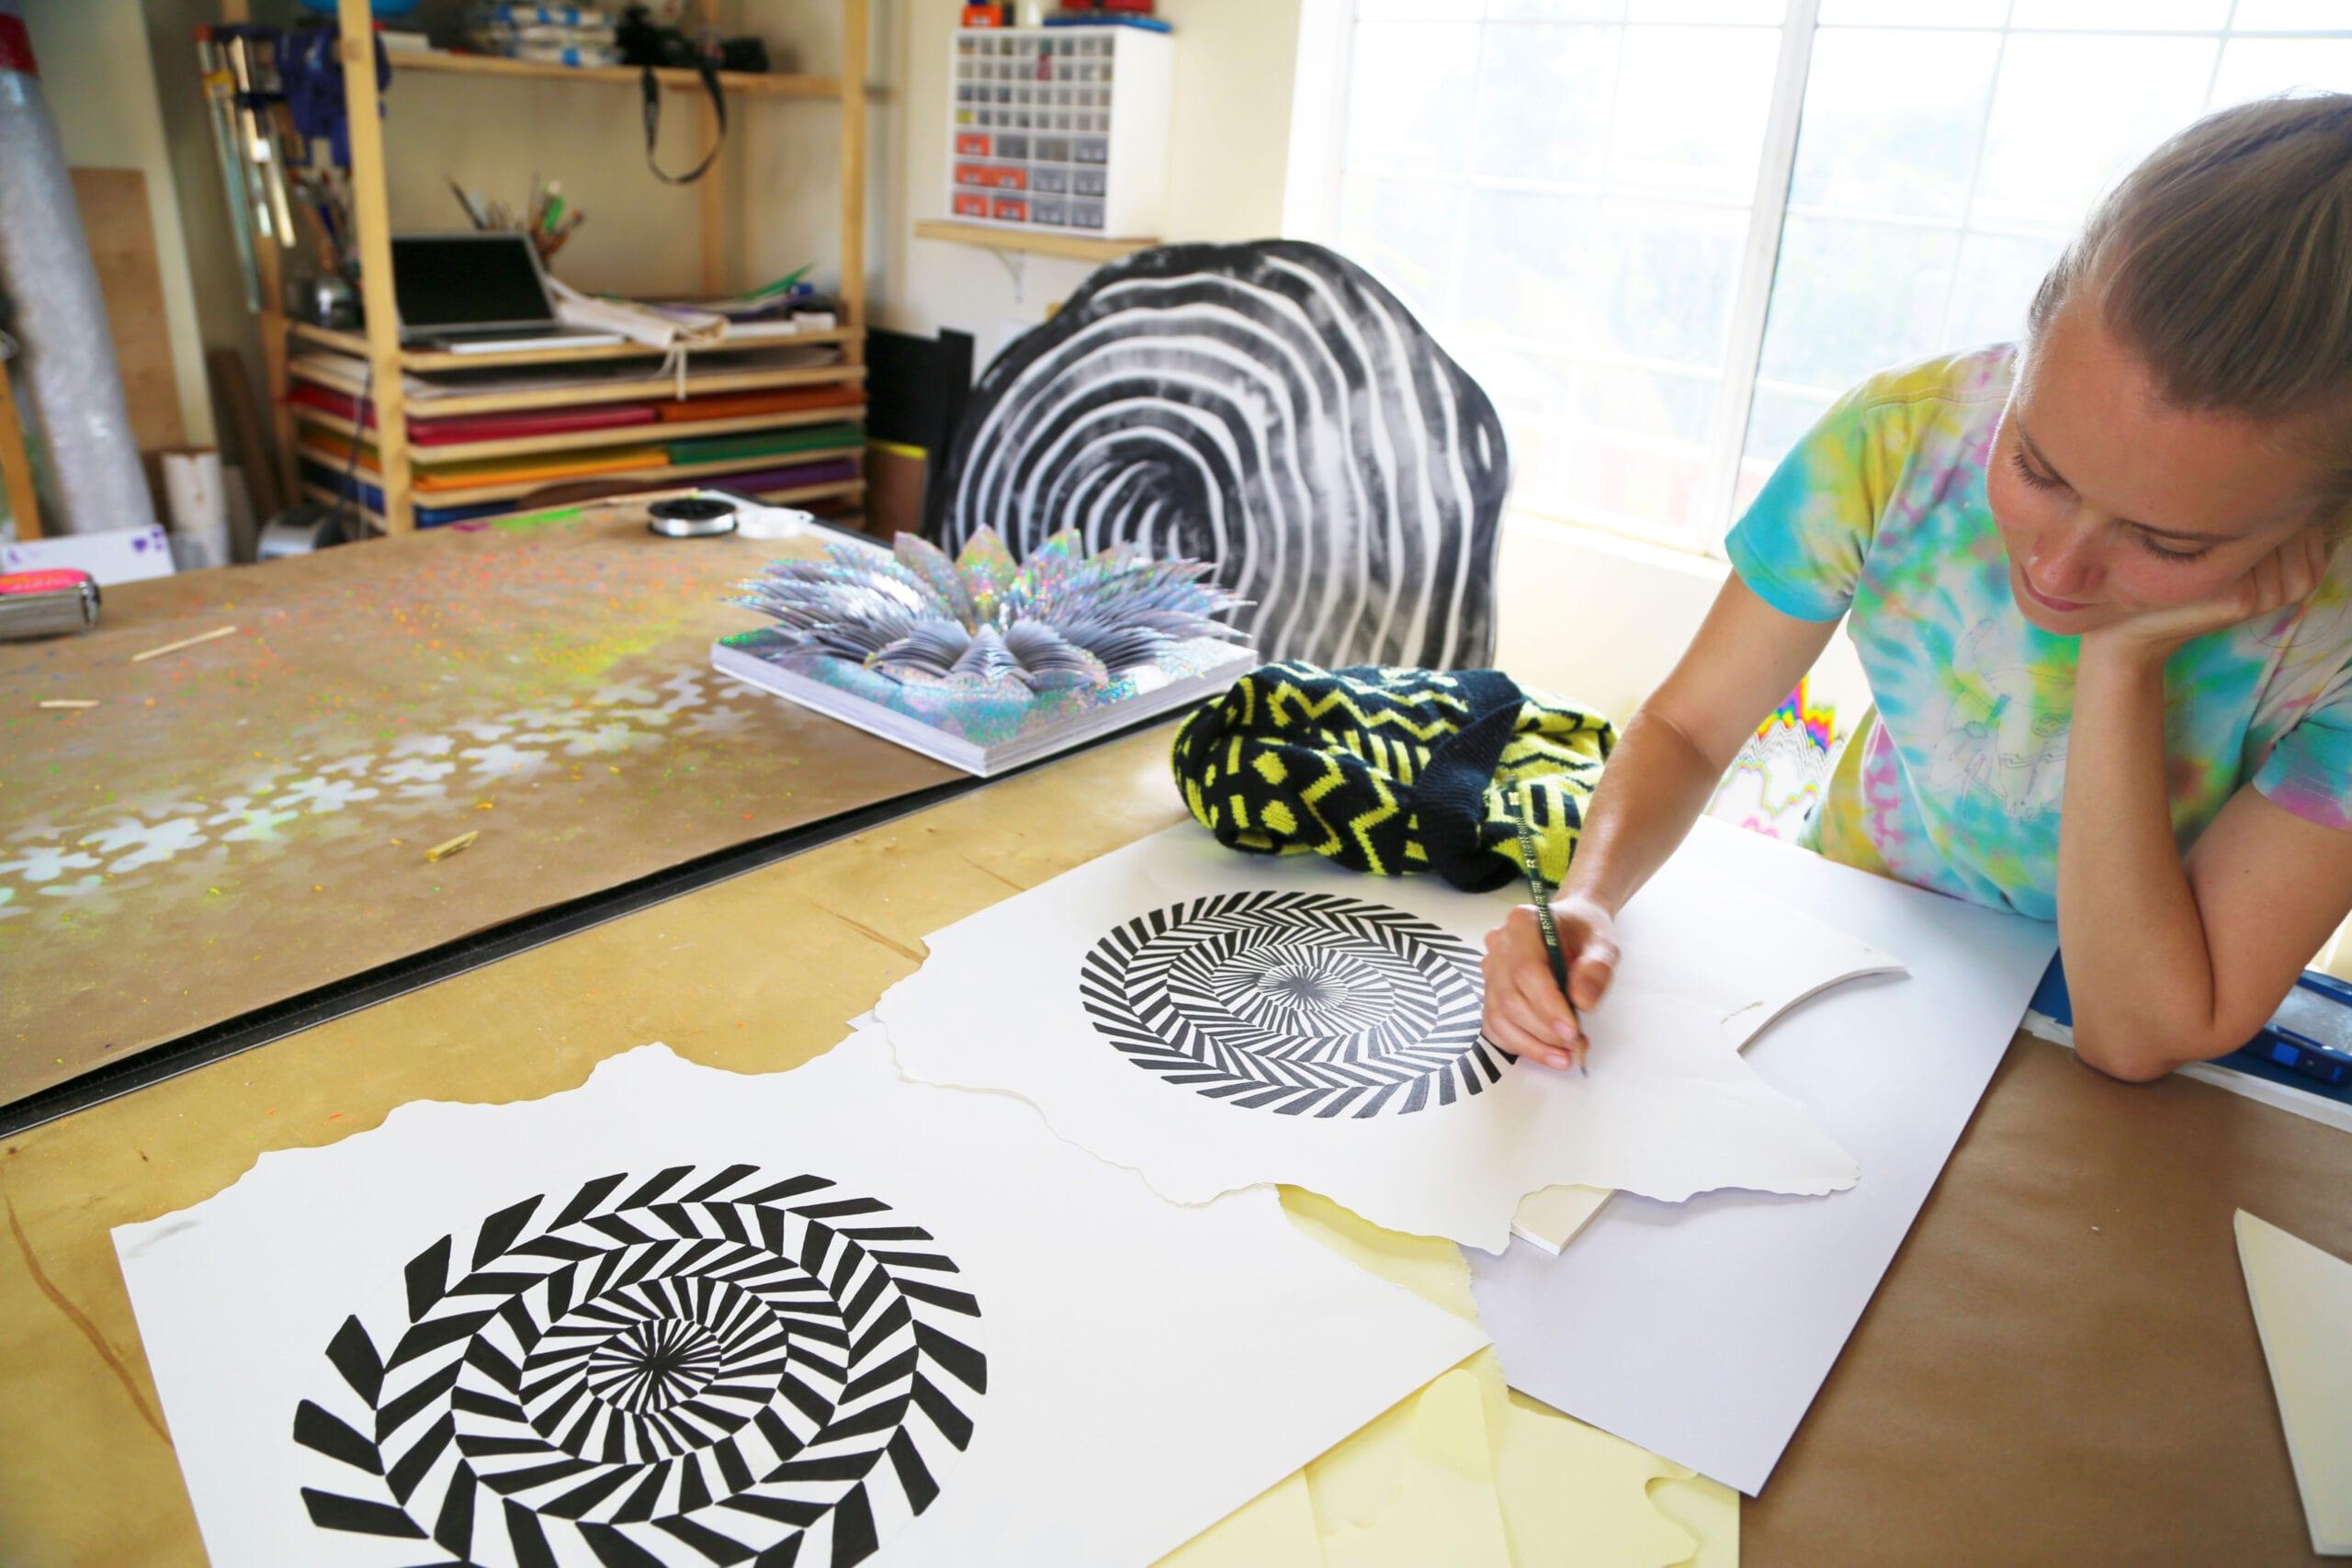 Photos of works in progress and Jen Stark at her studio. Image by Daniel Rolnik, 2013.